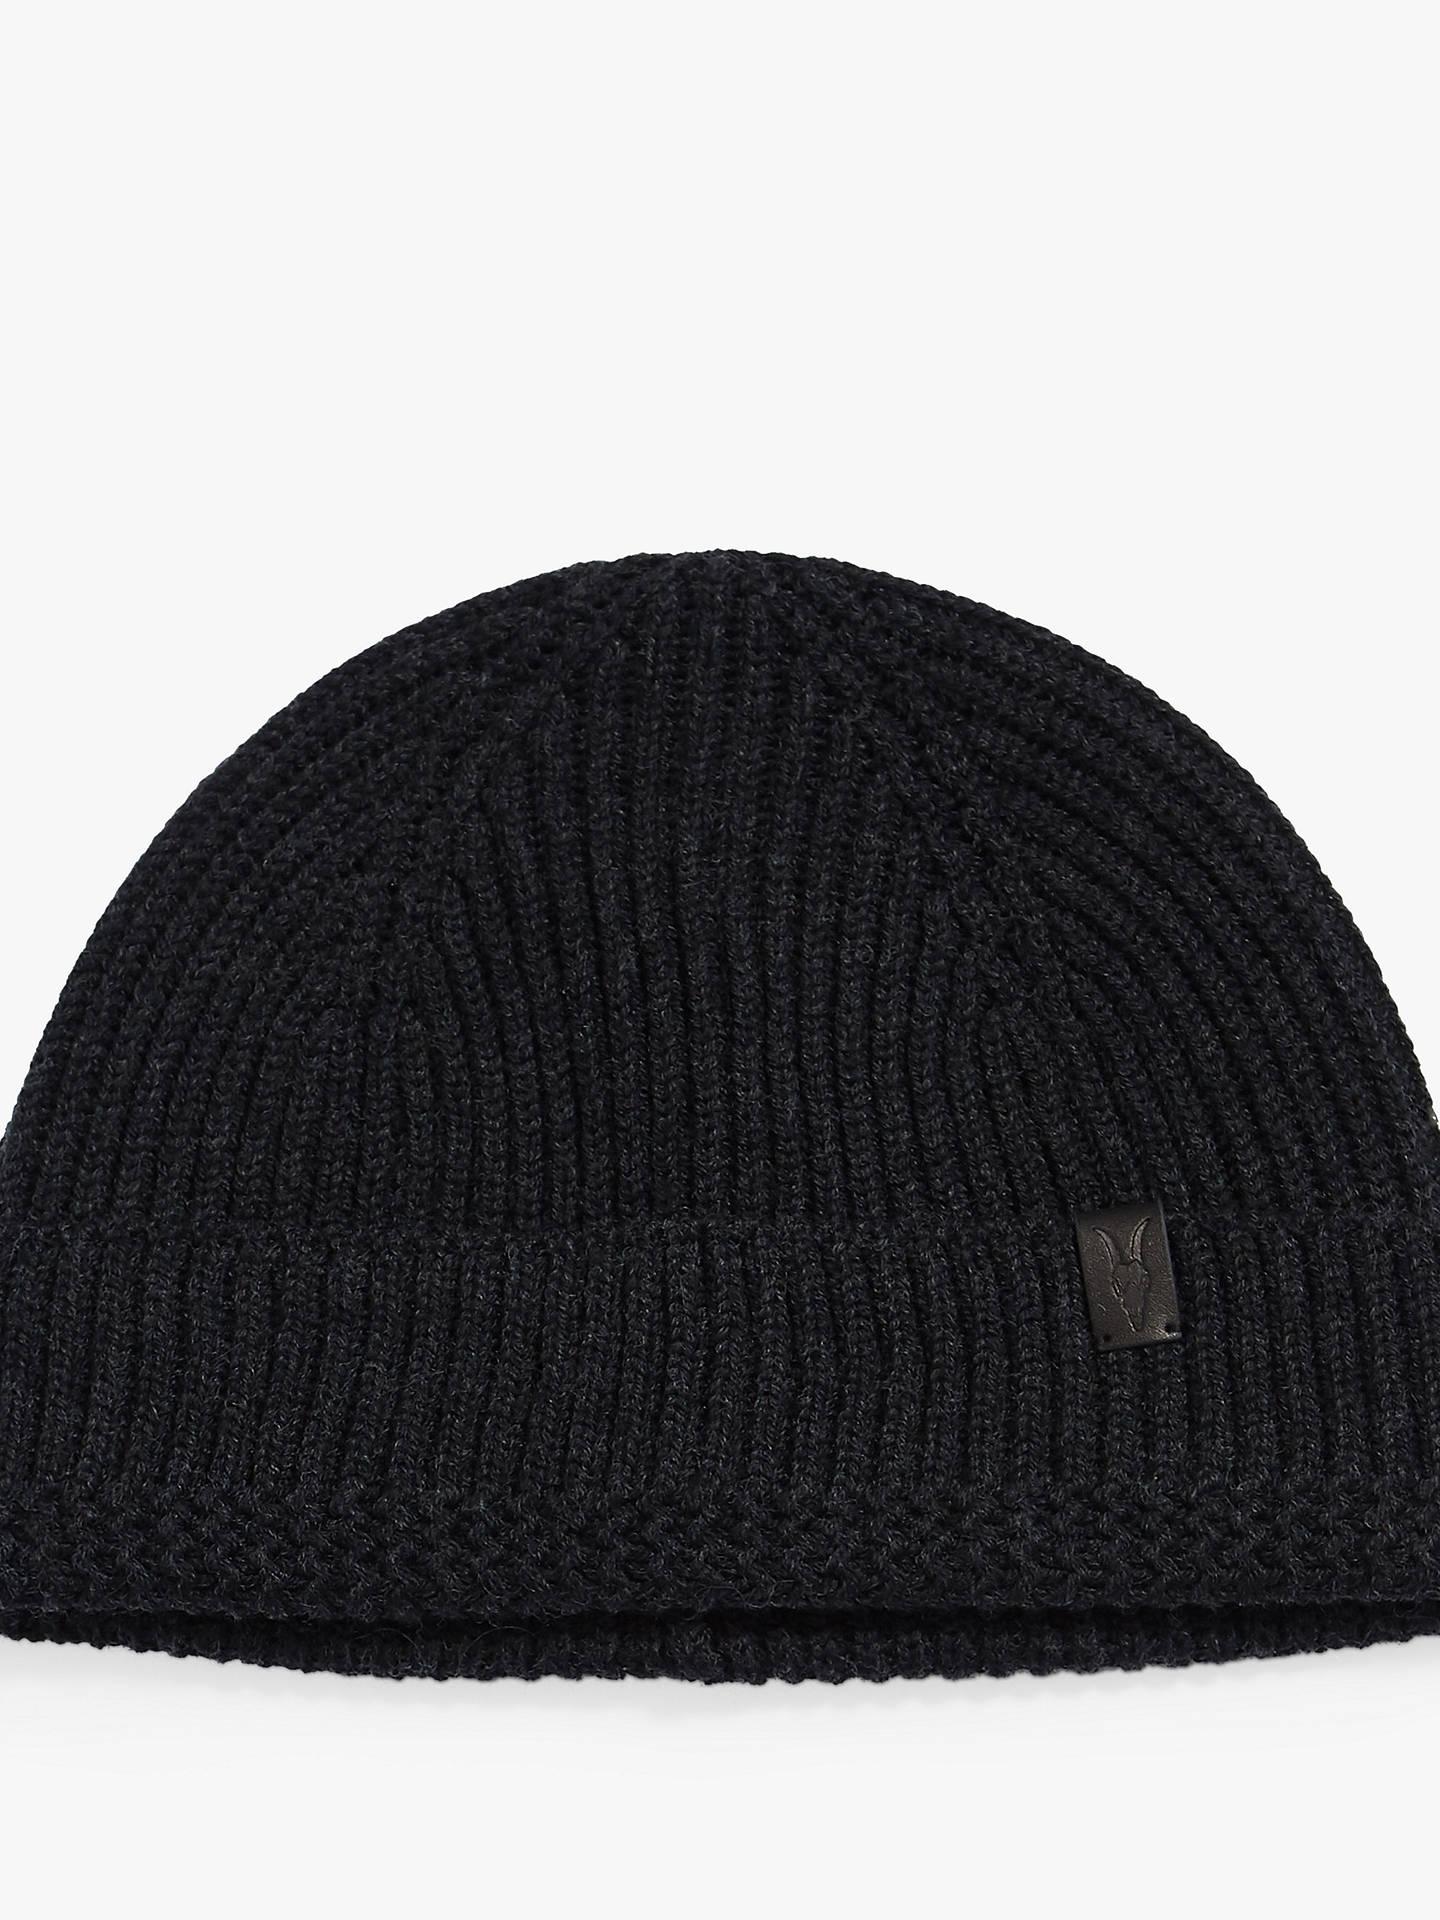 ddae2bd3b AllSaints Merino Beanie Hat at John Lewis & Partners